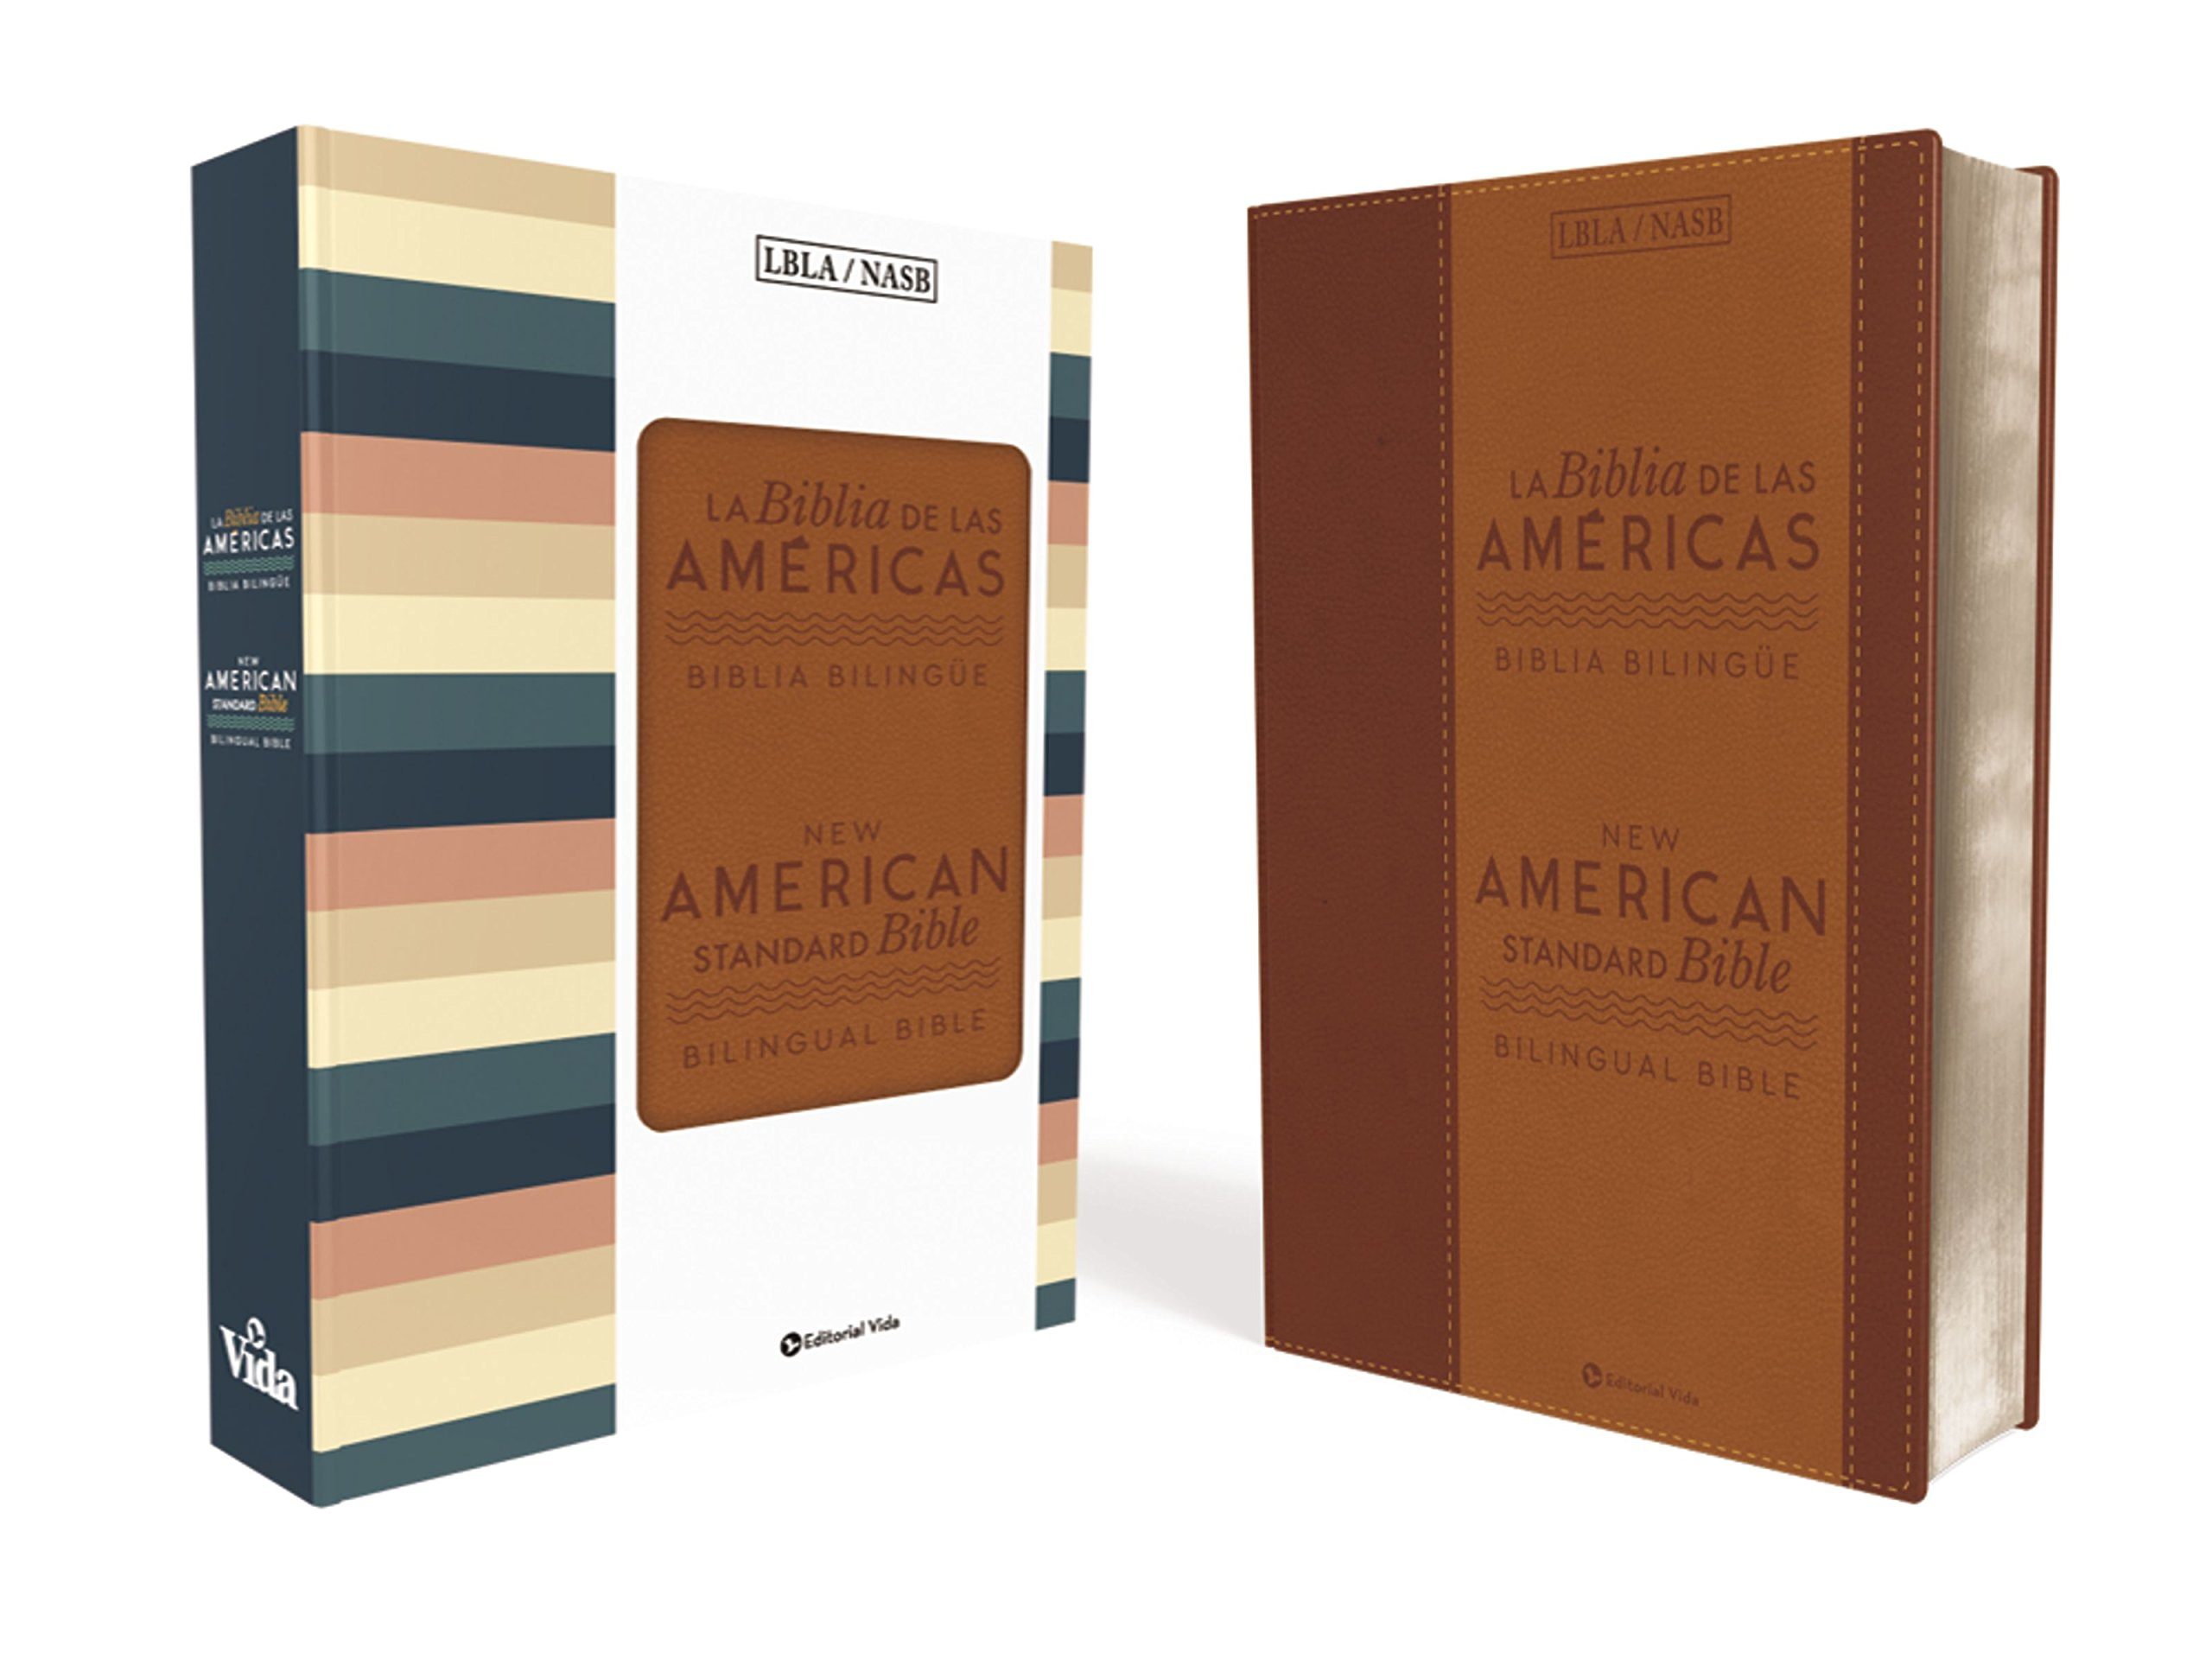 La Biblia de las Américas / New American Standard Bible - Biblia Bilingüe (Spanish Edition) PDF